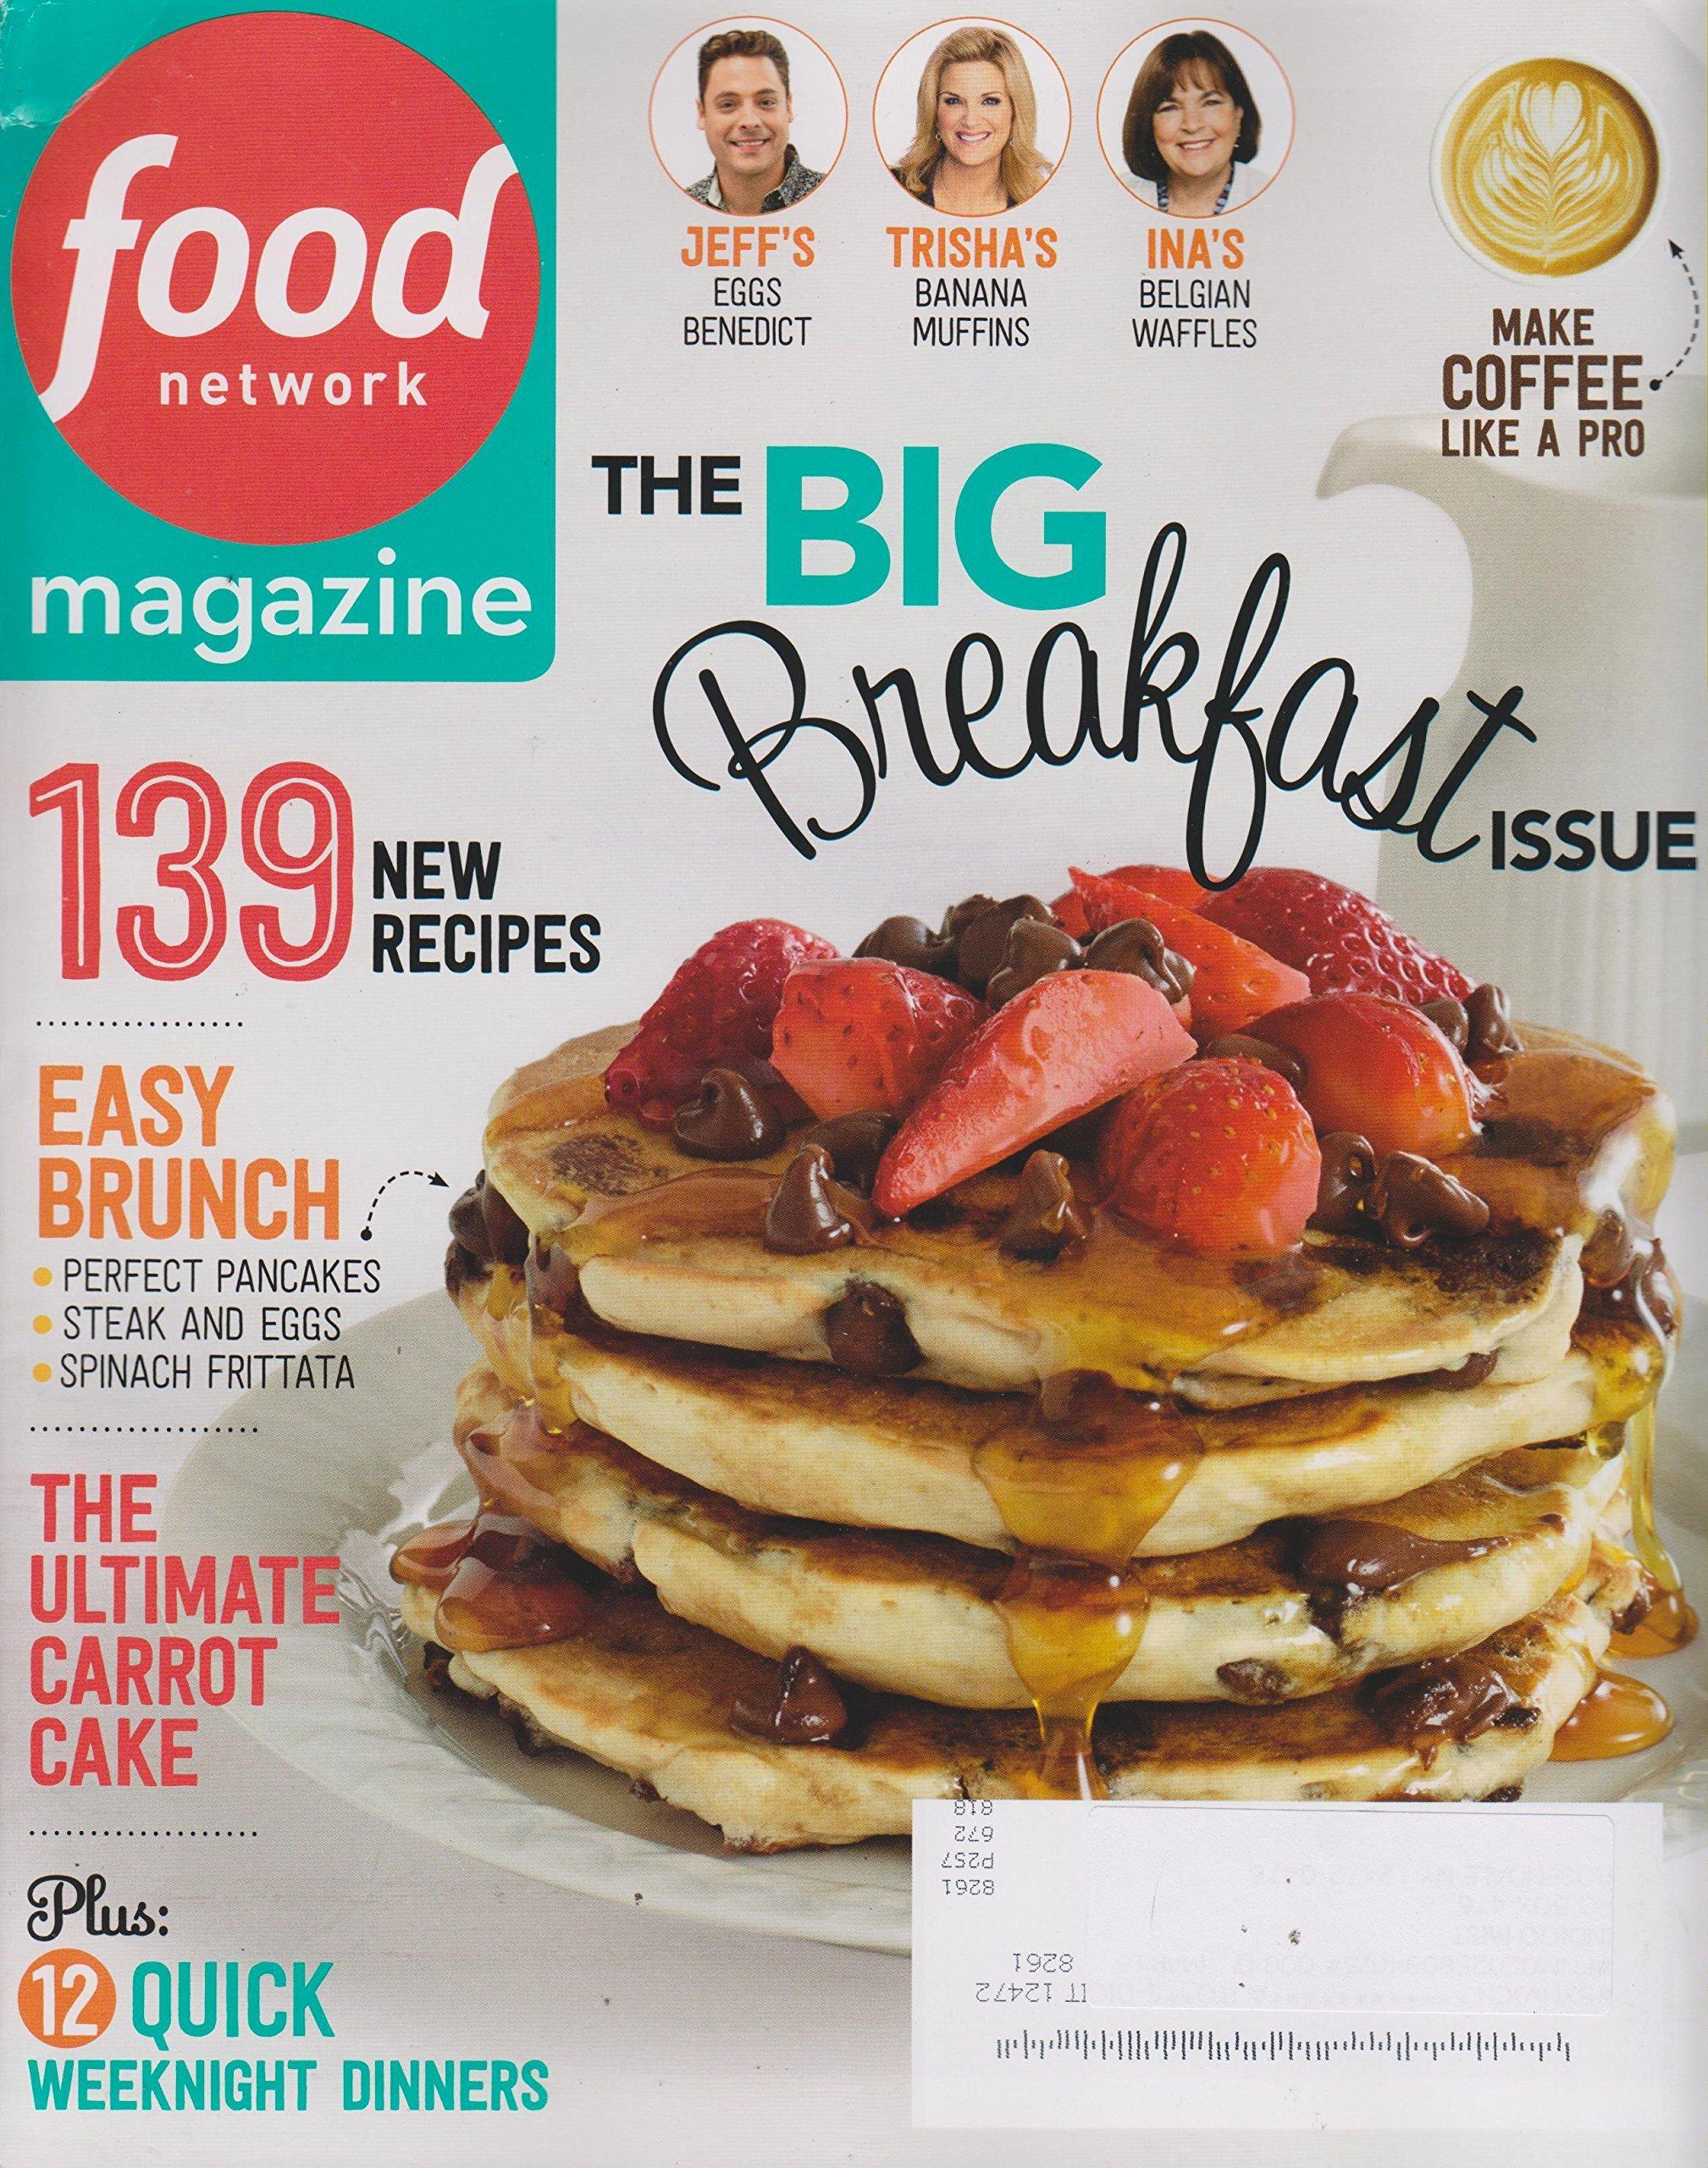 Food network magazine april 2015 the big breakfast issue amazon food network magazine april 2015 the big breakfast issue amazon books forumfinder Choice Image